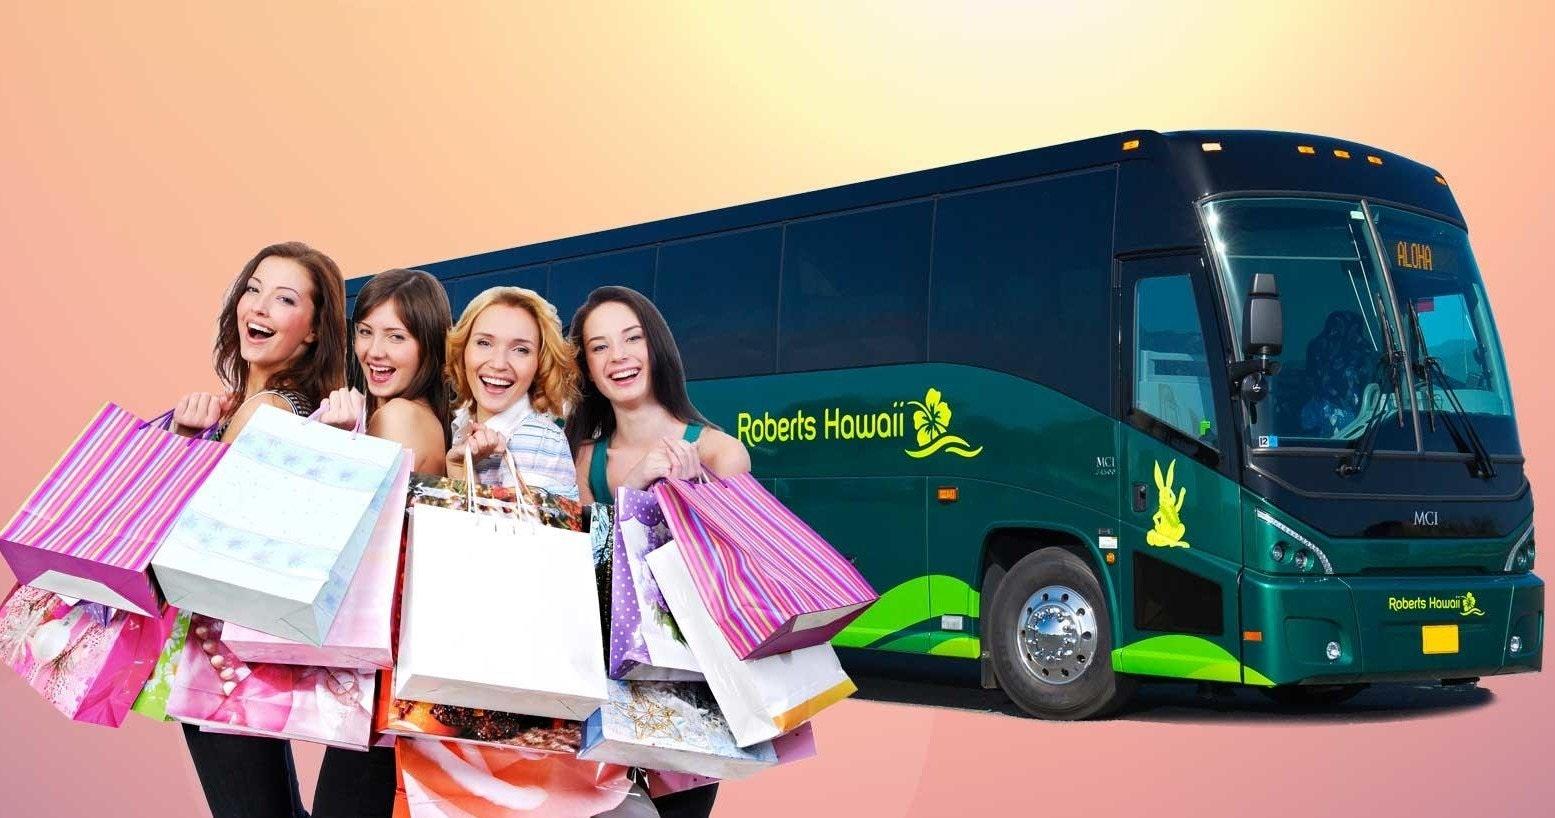 coupon for roberts hawaii express shuttle